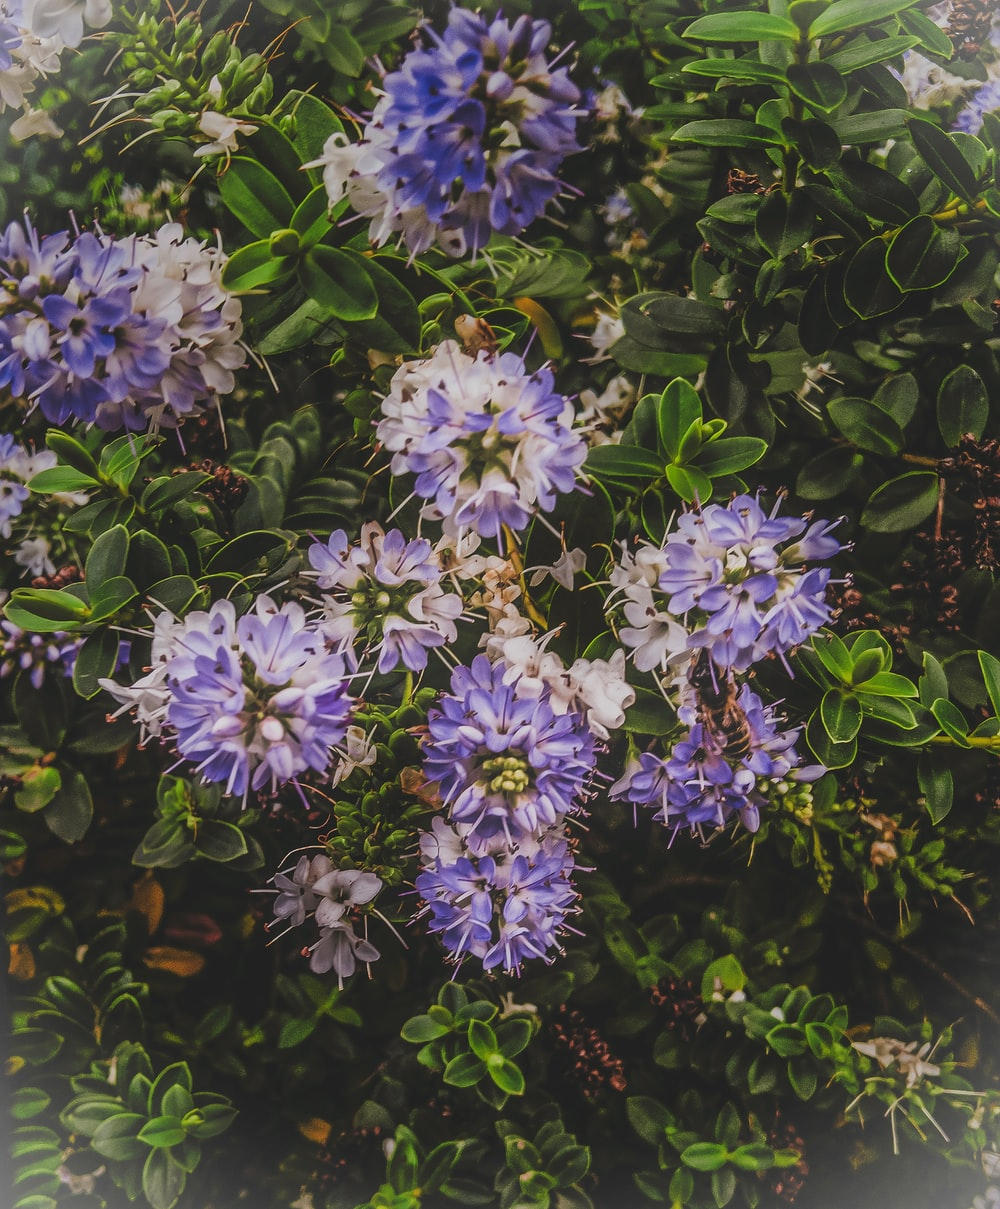 closeup photo of white and purple petaled flowers